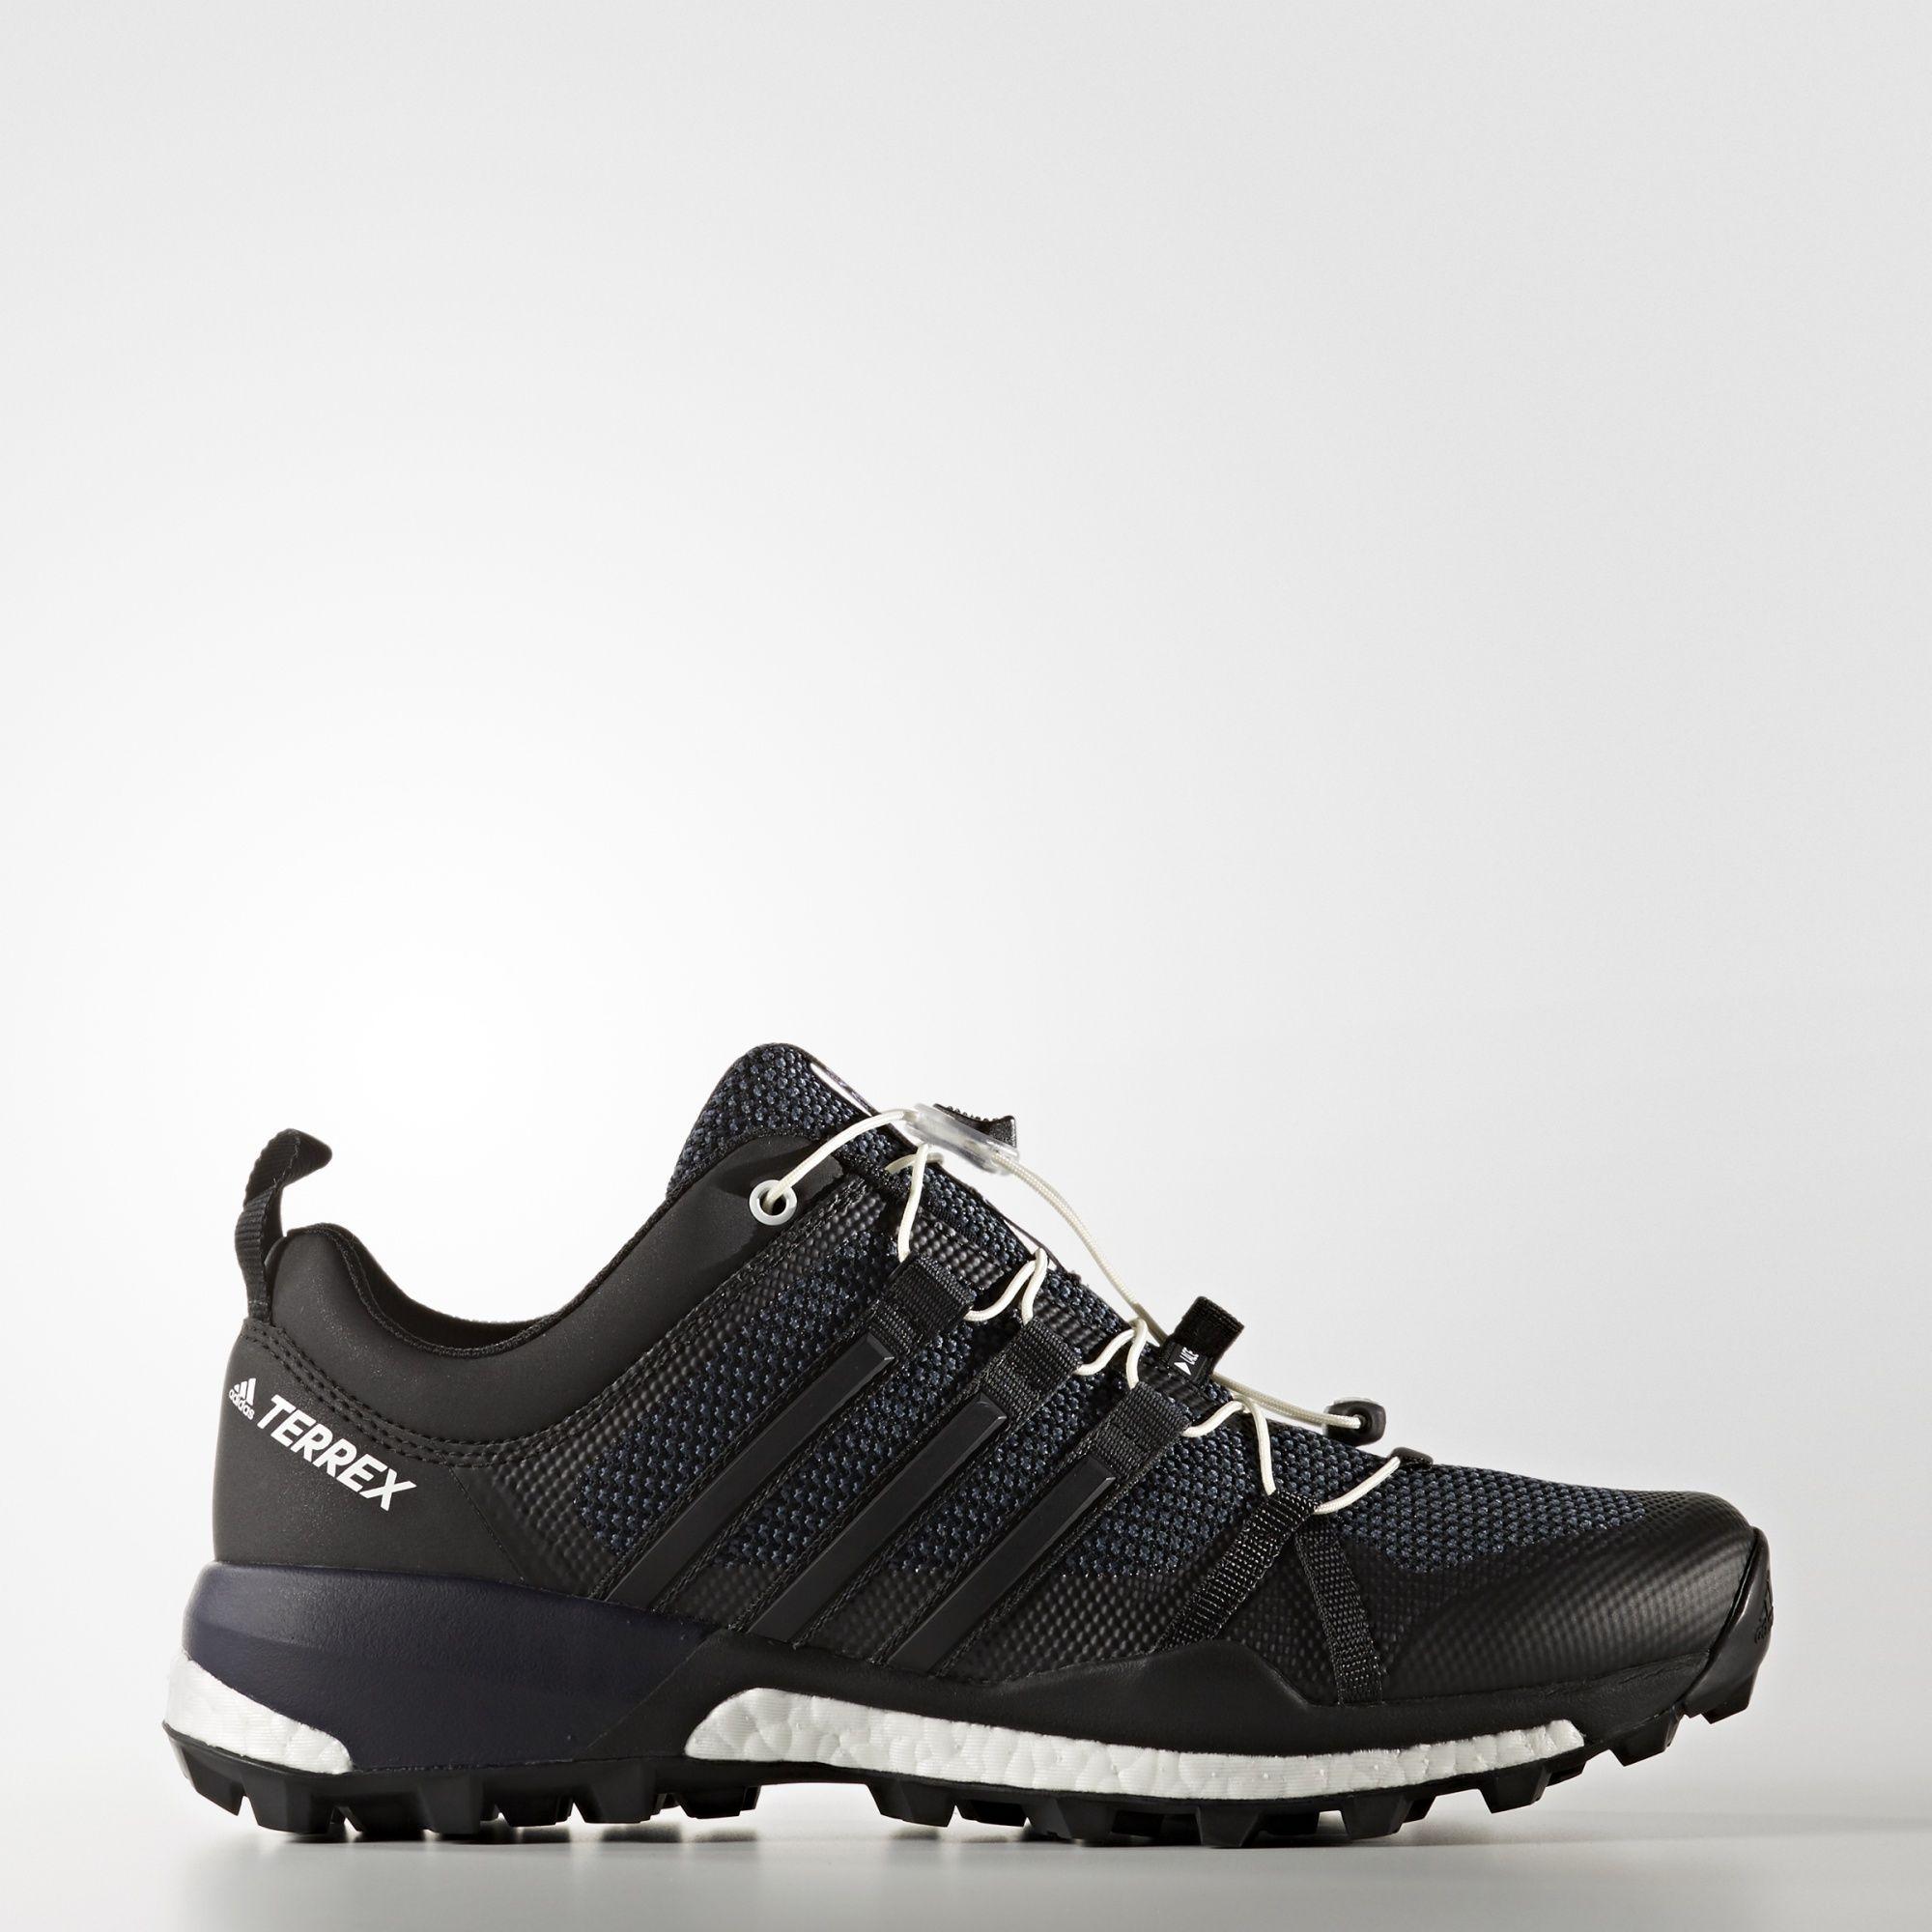 adidas - Terrex Agravic GTX Shoes   Miscellaneous   Pinterest   Adidas and  Kicks shoes